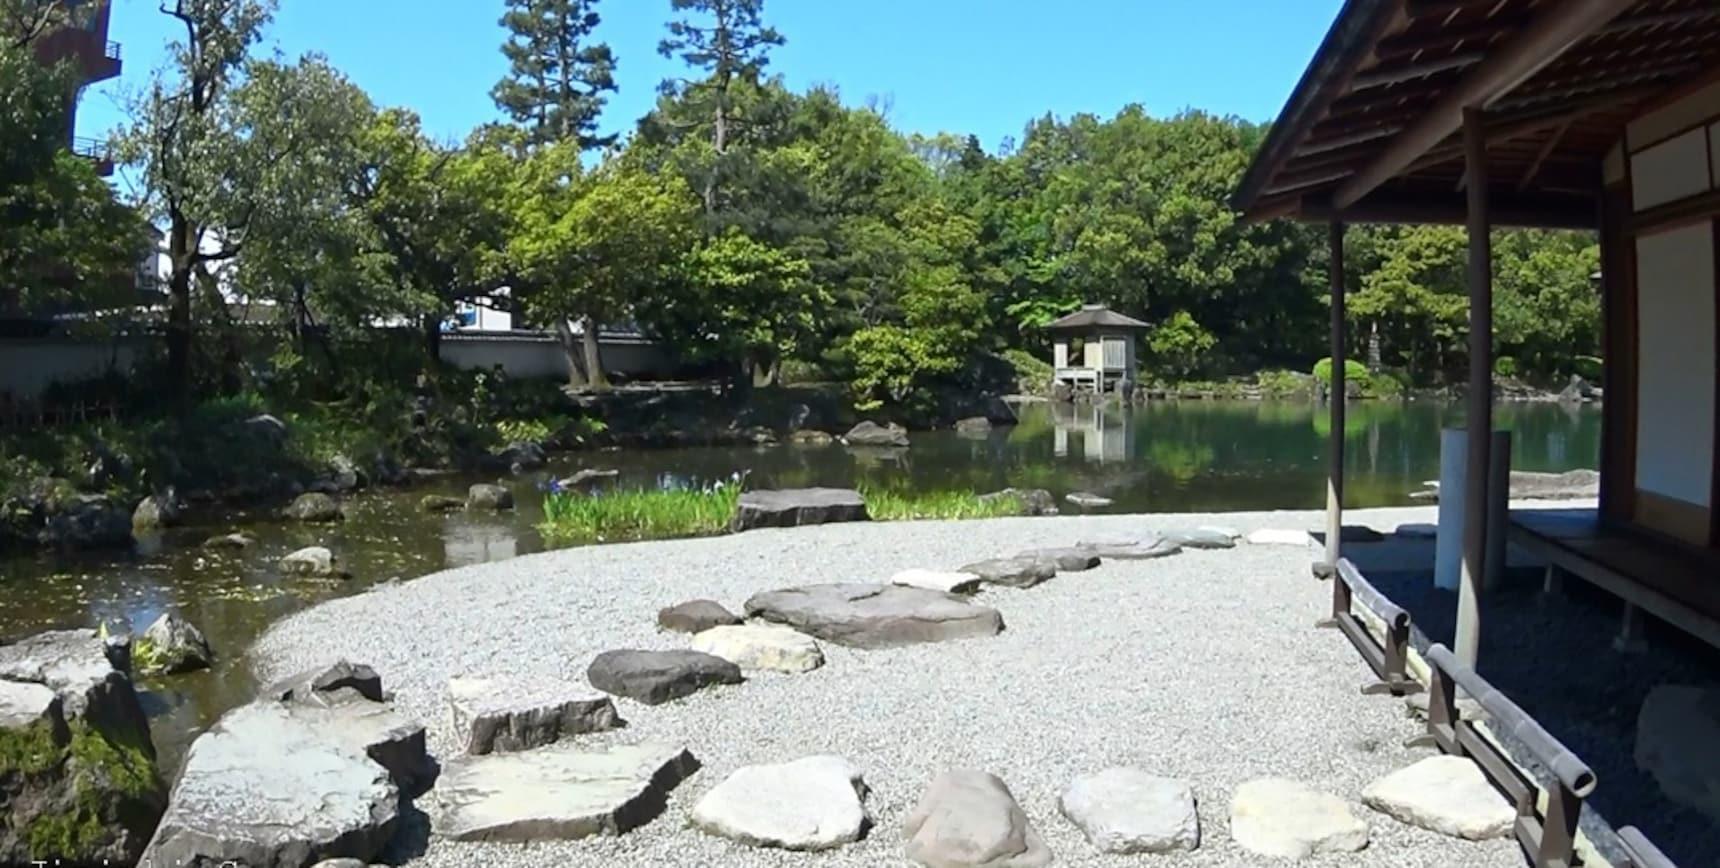 Yokokan Teien: A Splendid Secret Garden